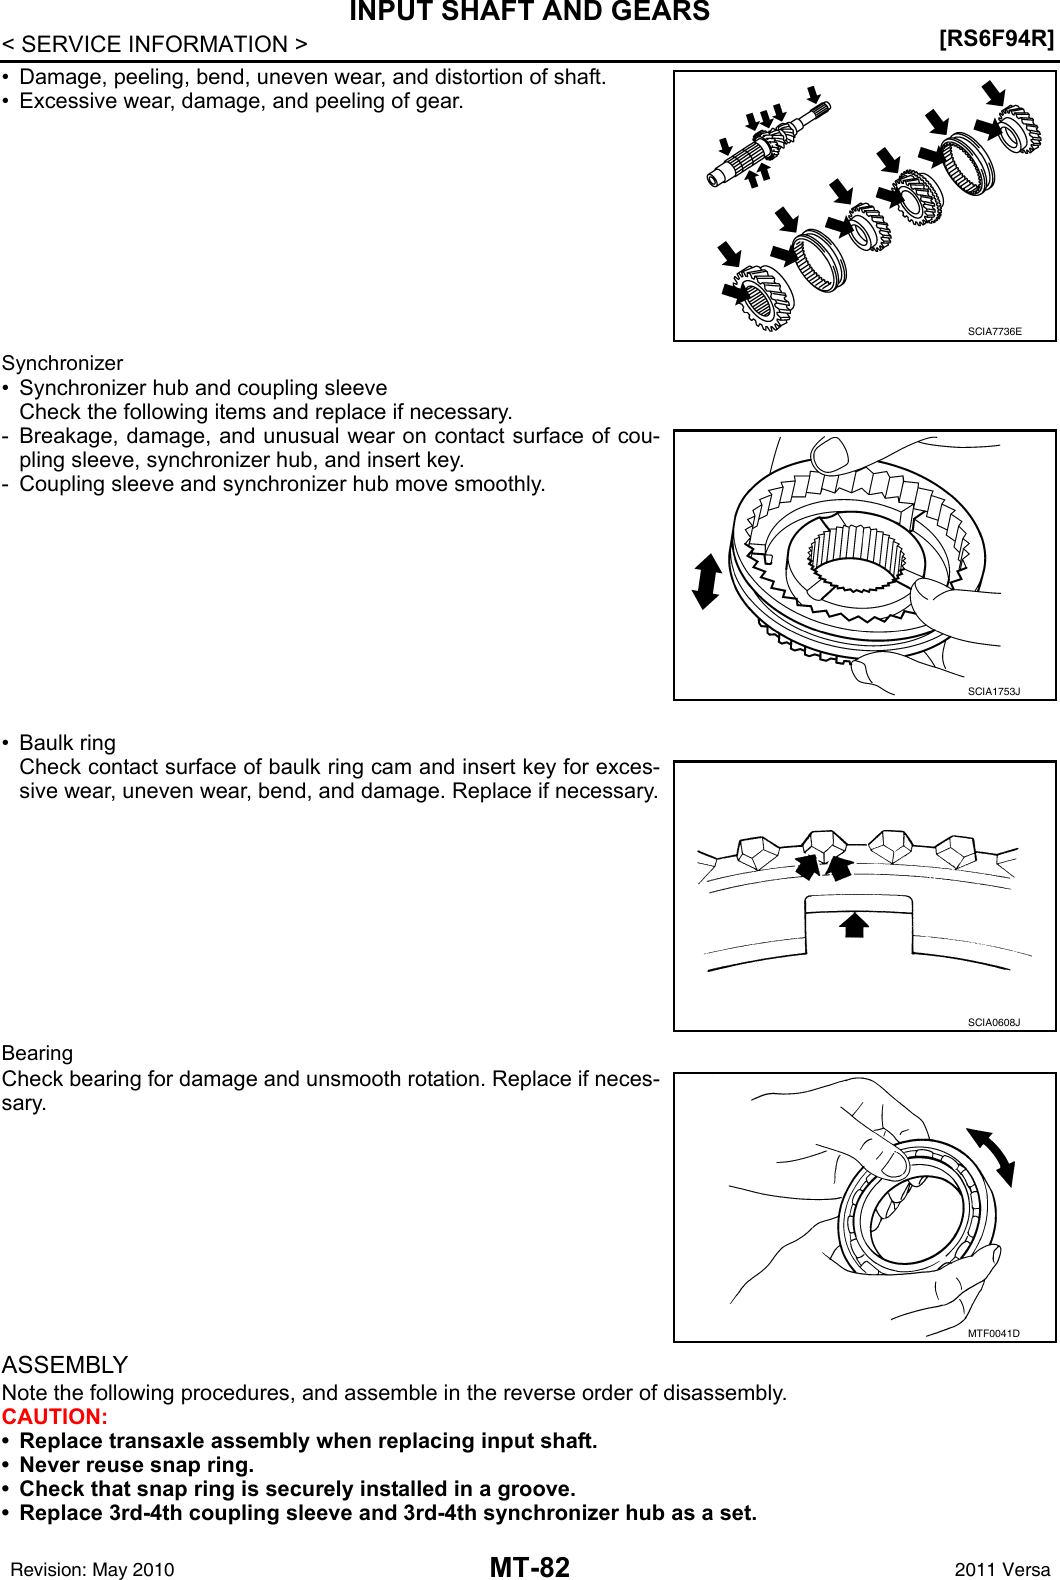 Nissan 2011 Versa Owners Manual SM1E 1C11U0(MT)